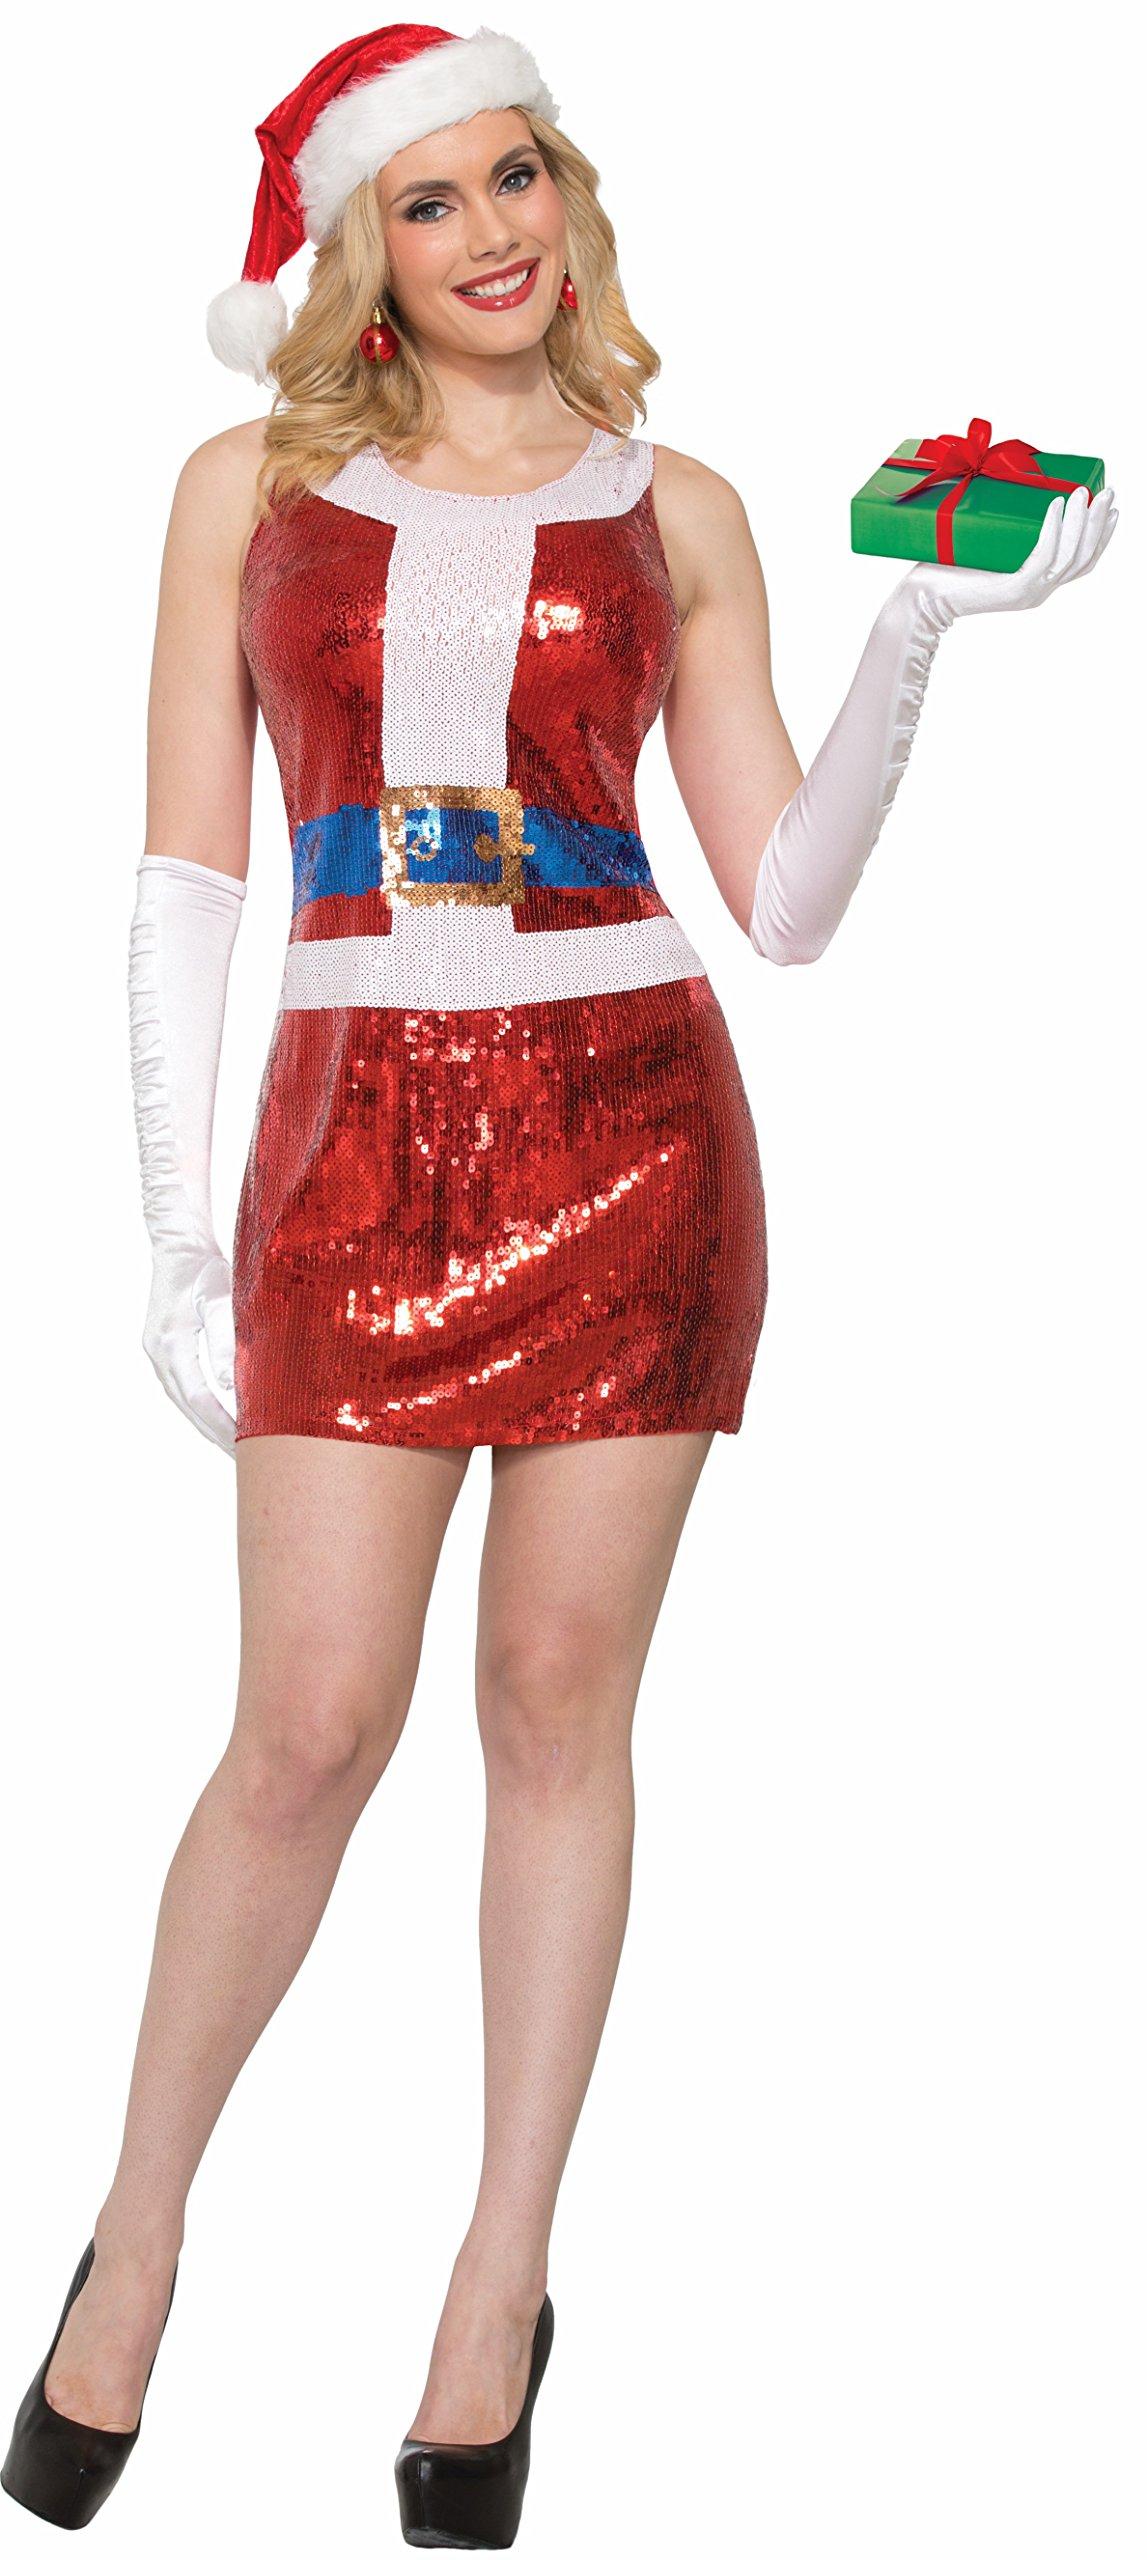 Forum Novelties Child Sequin Holiday Dress